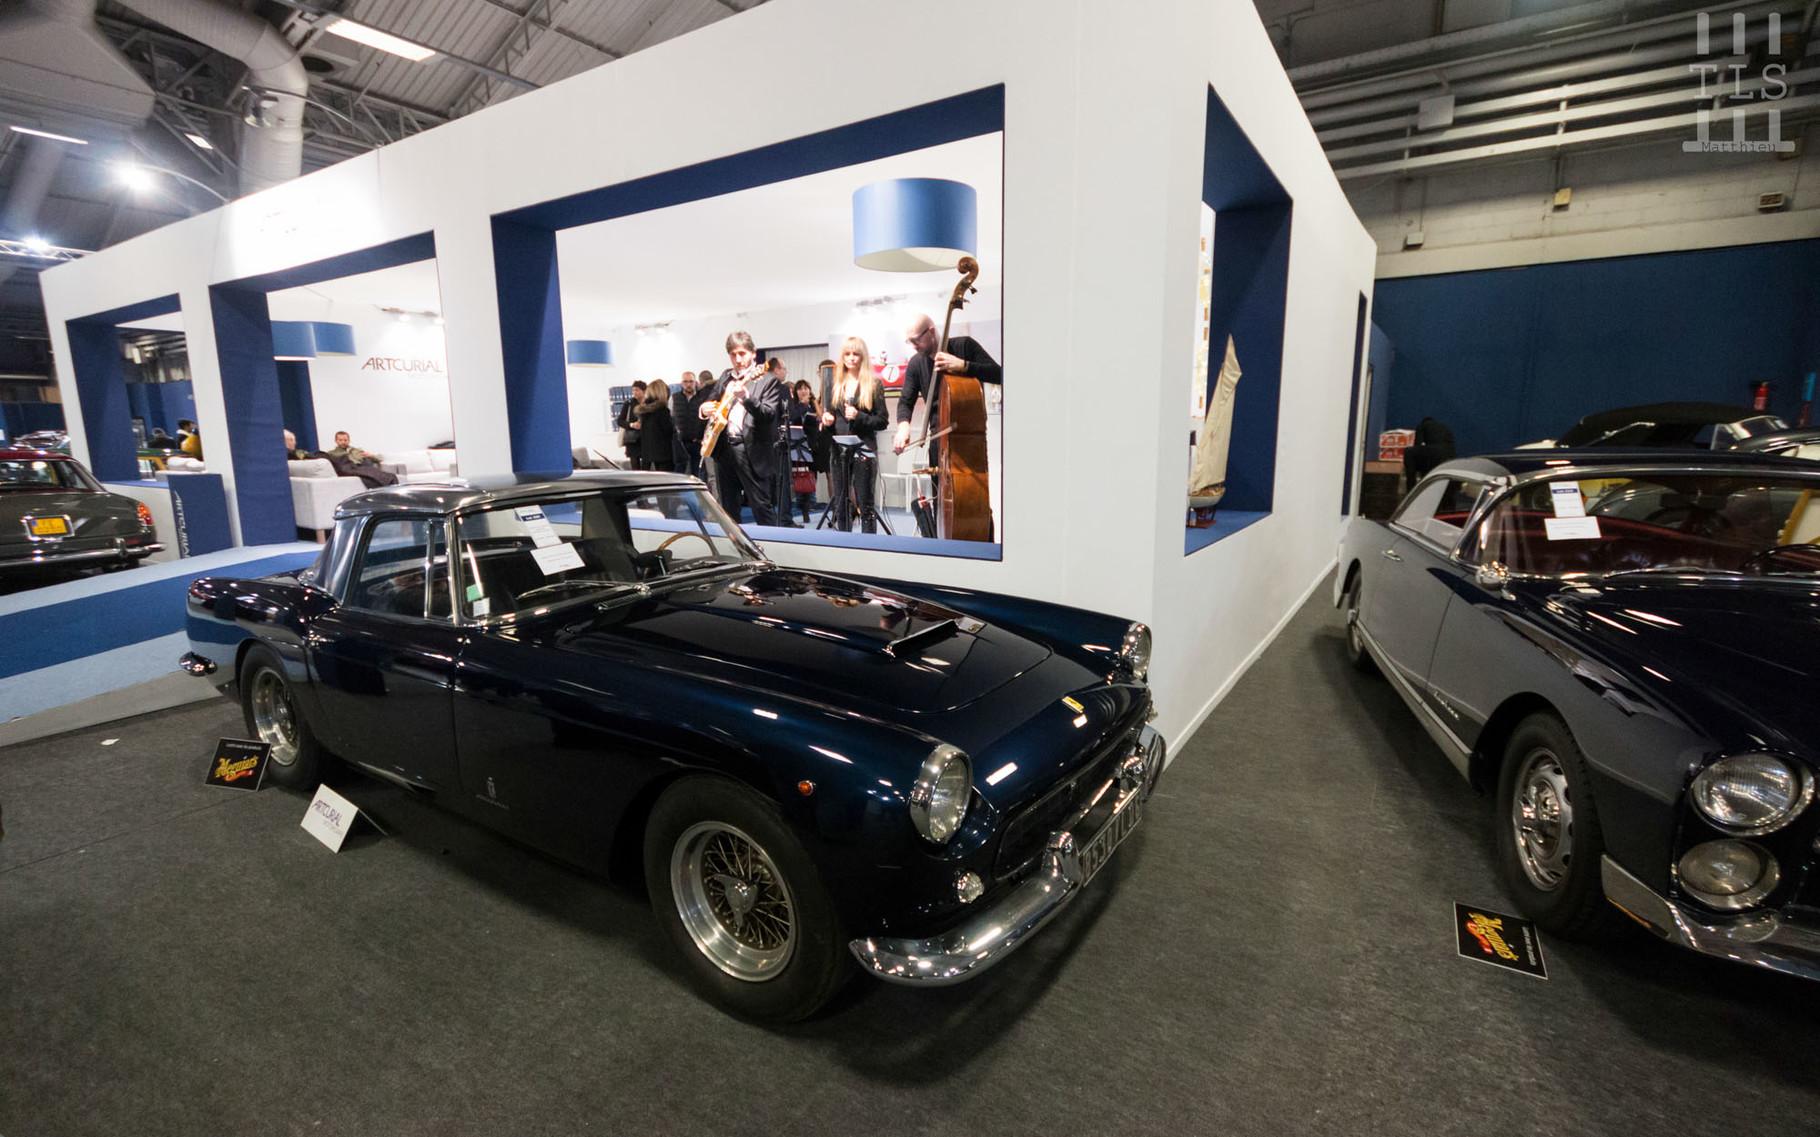 Ferrari 250 GT Cabriolet Pininfarina Serie II : estimée entre 1 400 000 et 1 800 000 euros, invendue.